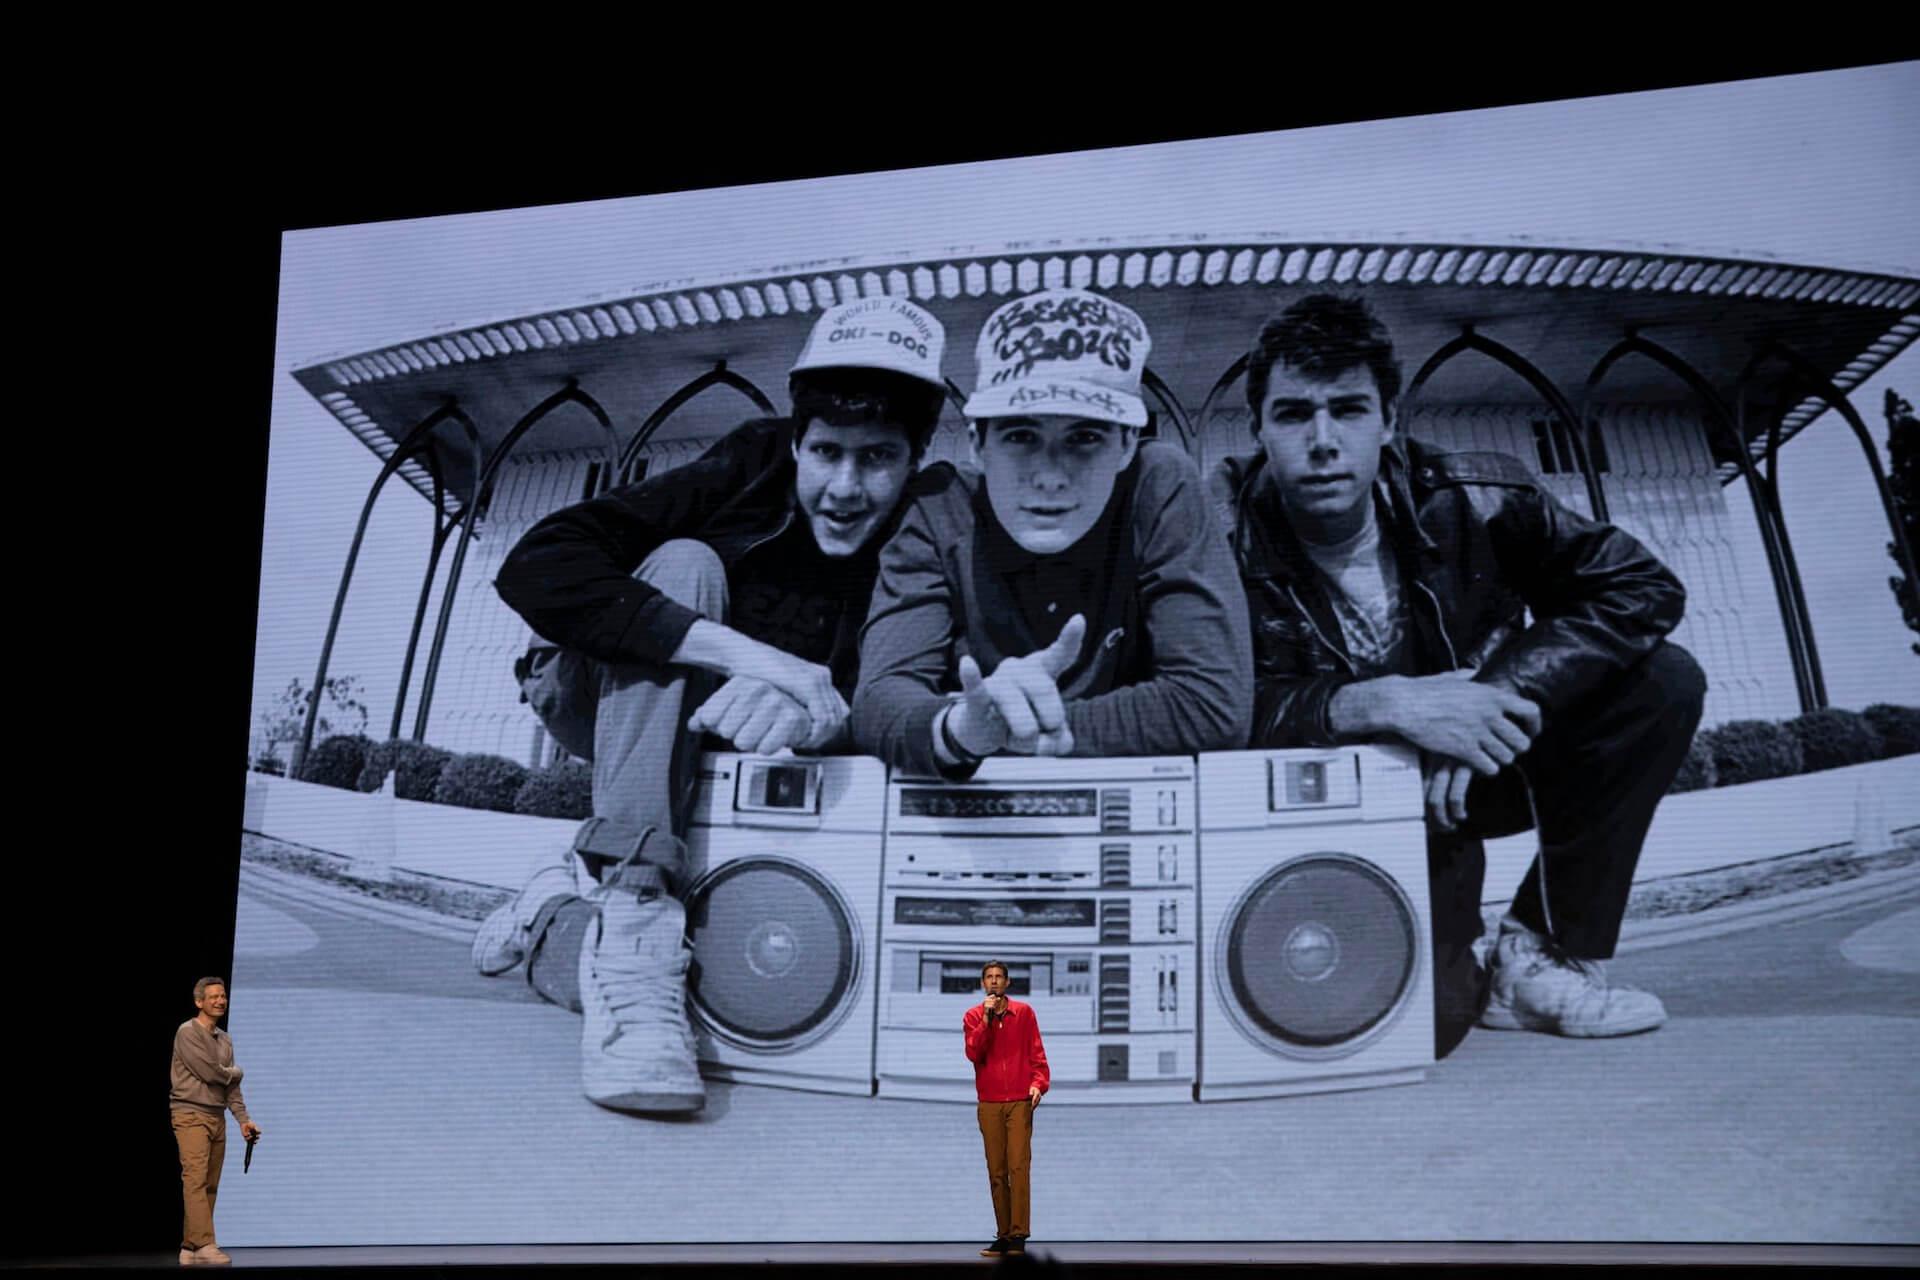 Apple TV+で配信予定のビースティ・ボーイズのドキュメンタリー『Beastie Boys Story』予告編が解禁|スパイク・ジョーンズが監督 art200128_beastieboys_main